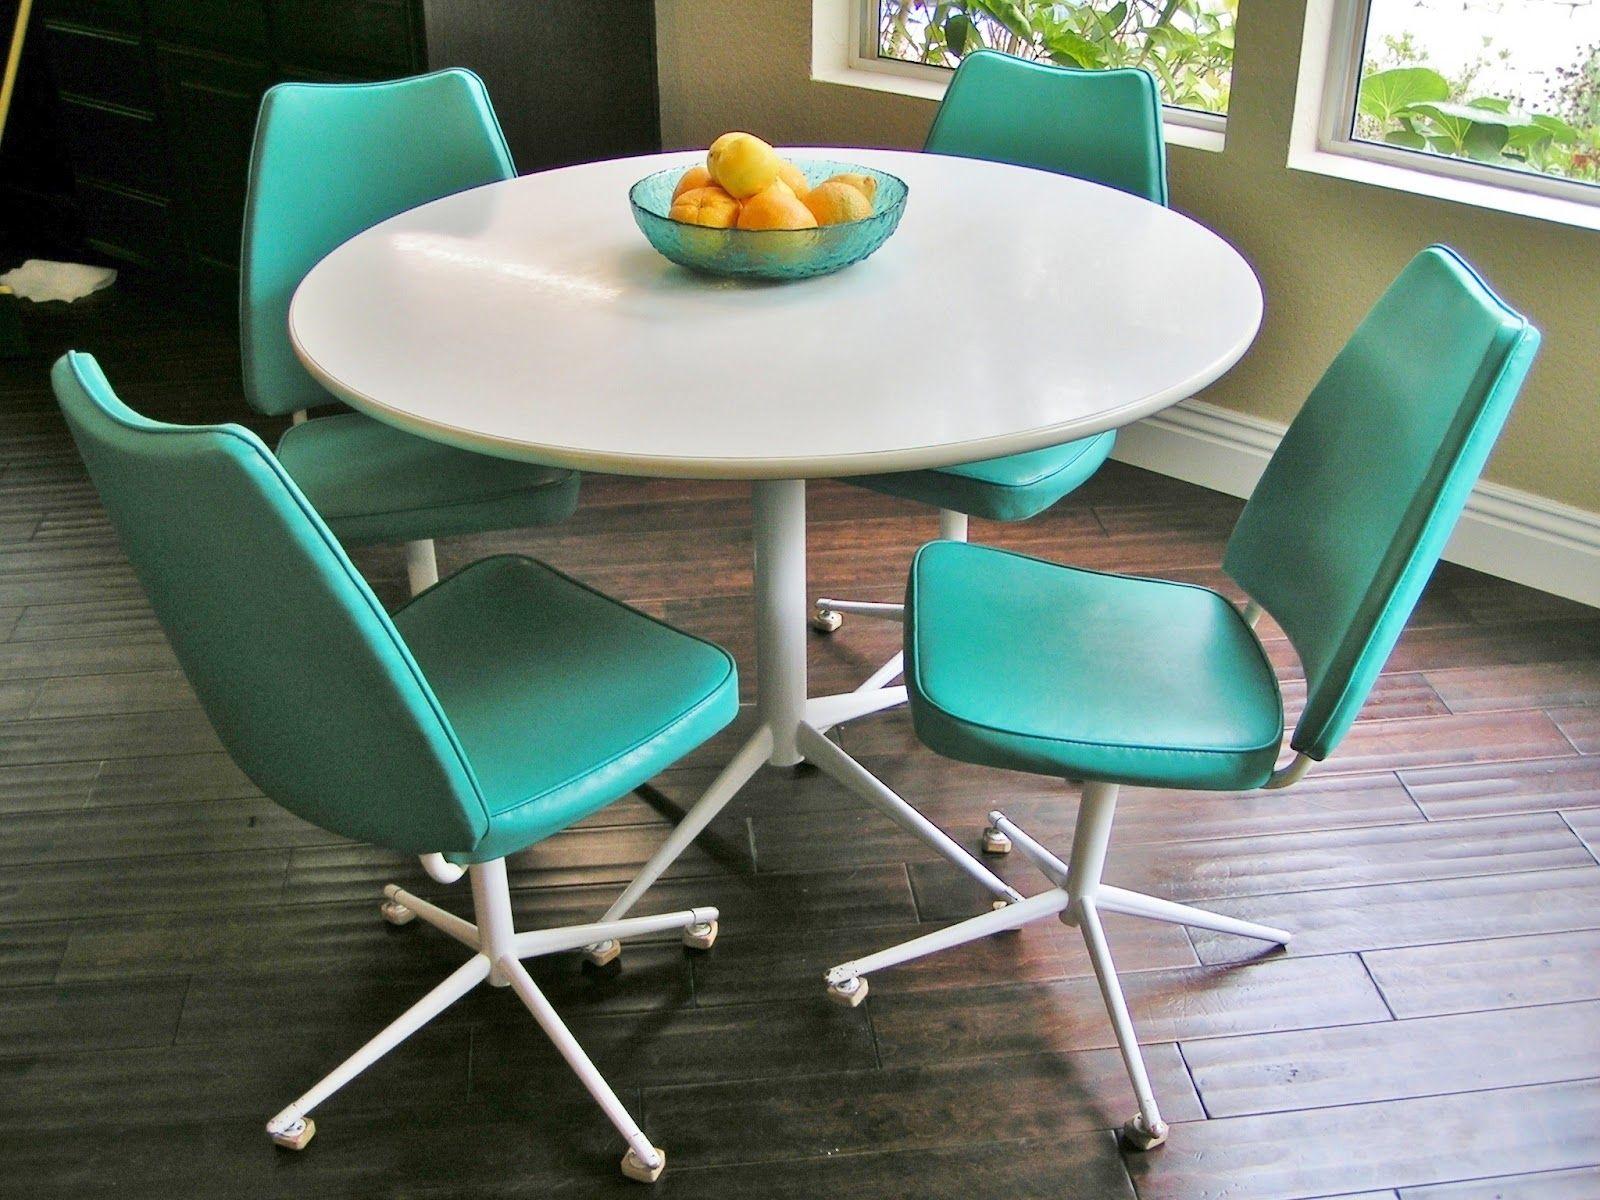 vintagec dinette sets | Sleek and Simple Lines: Vintage Turquoise ...